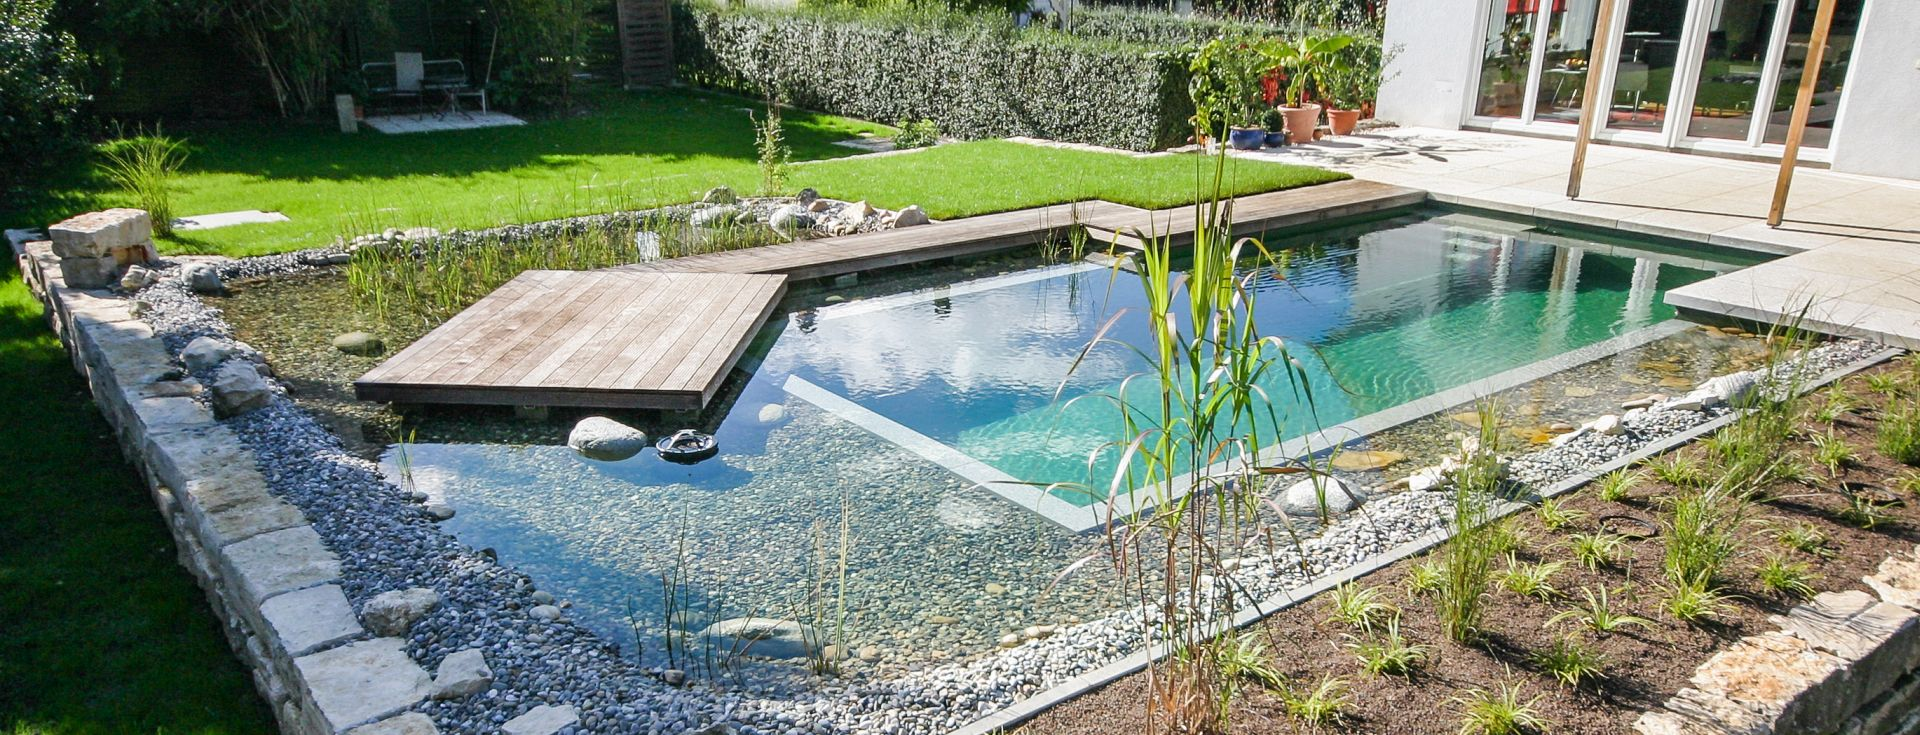 Grimm Pools Garten Kirchheim Teck